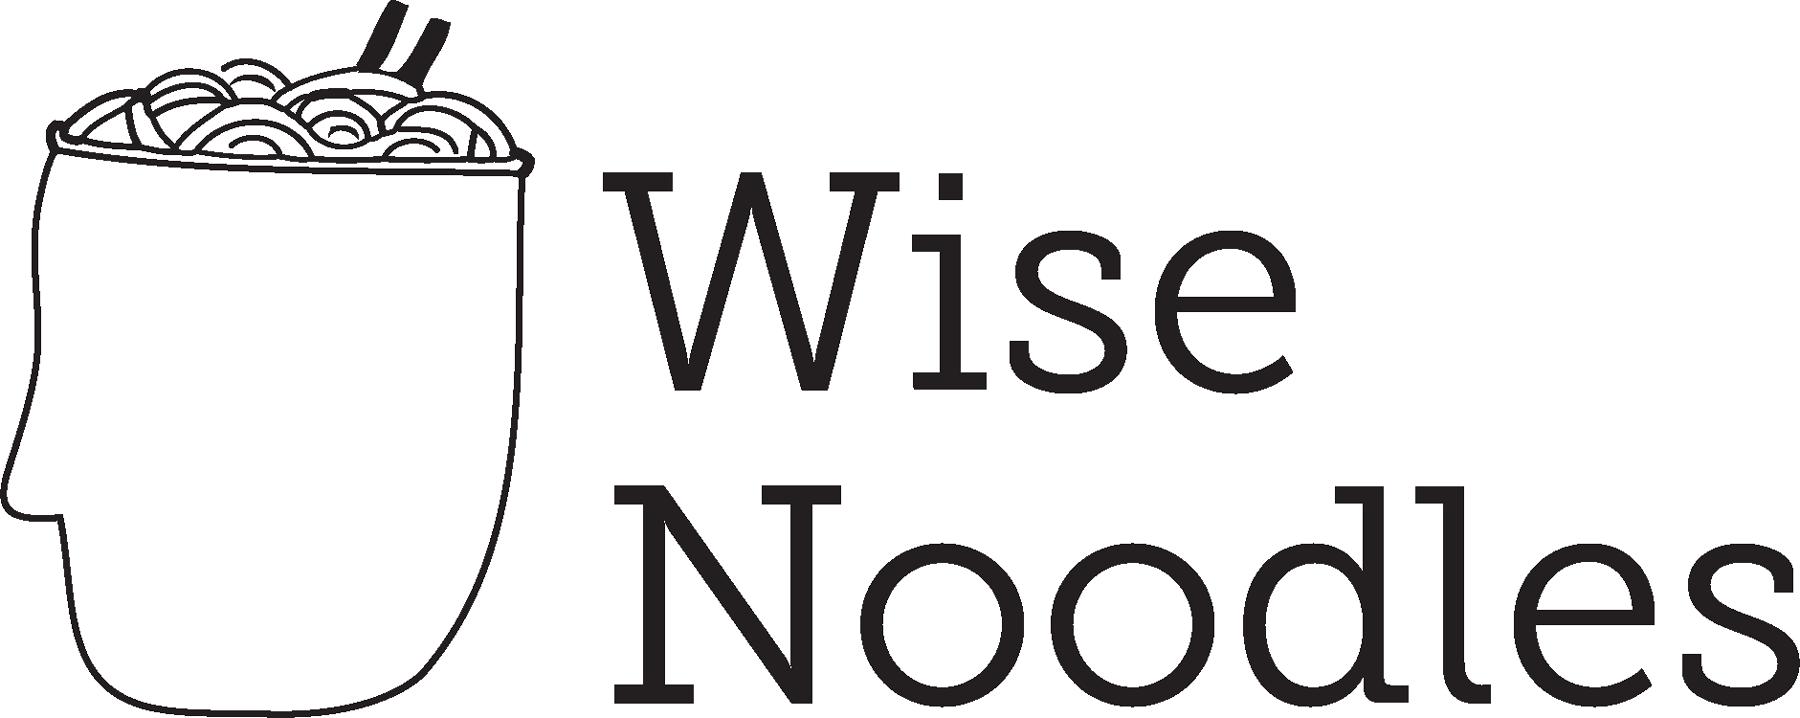 Wise Noodles